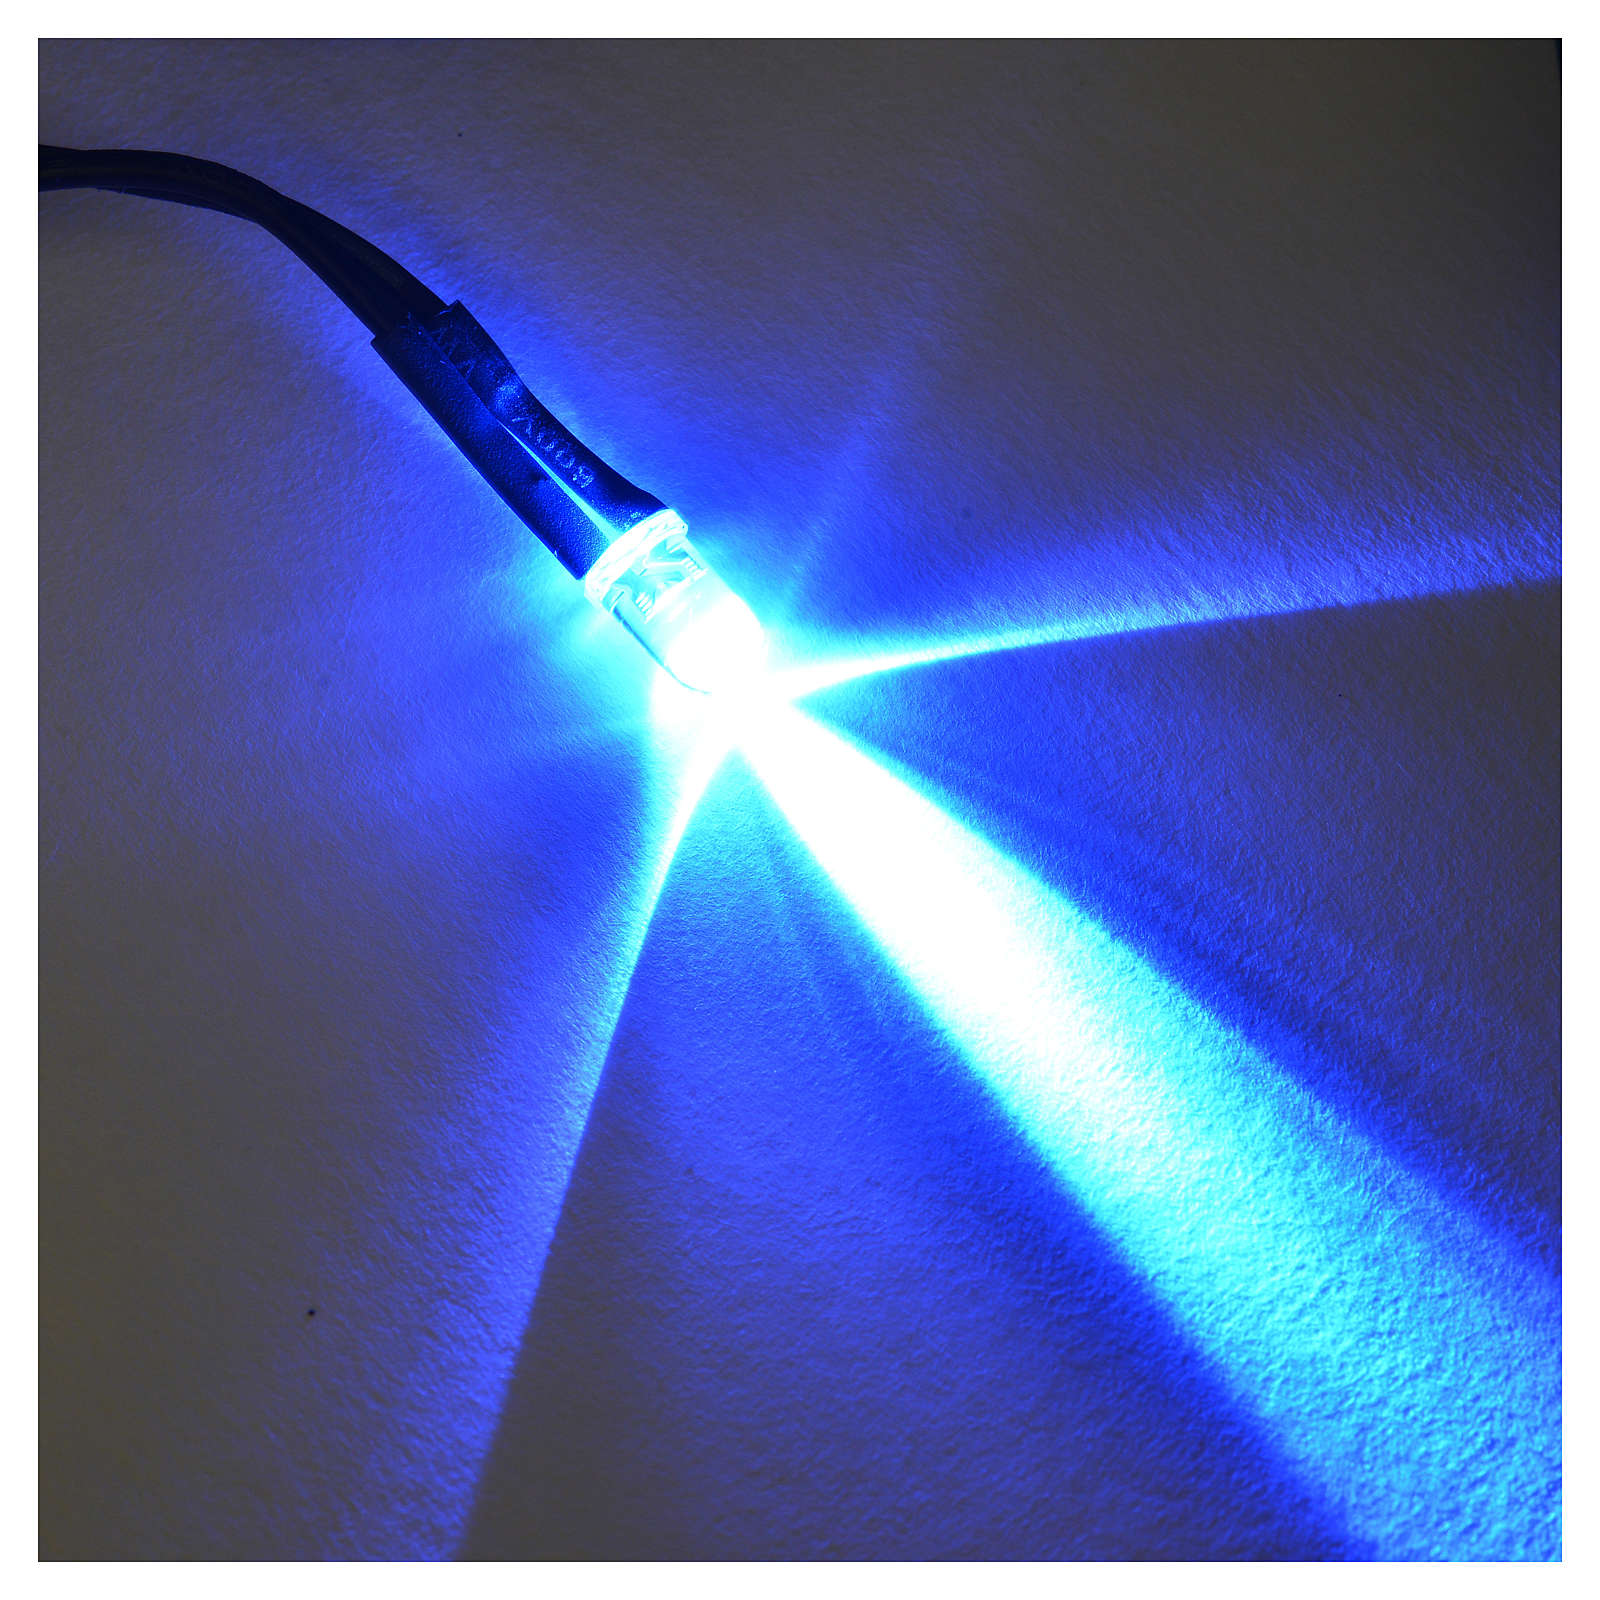 Led diam 5 mm luce blu per centraline serie Frisalight 4